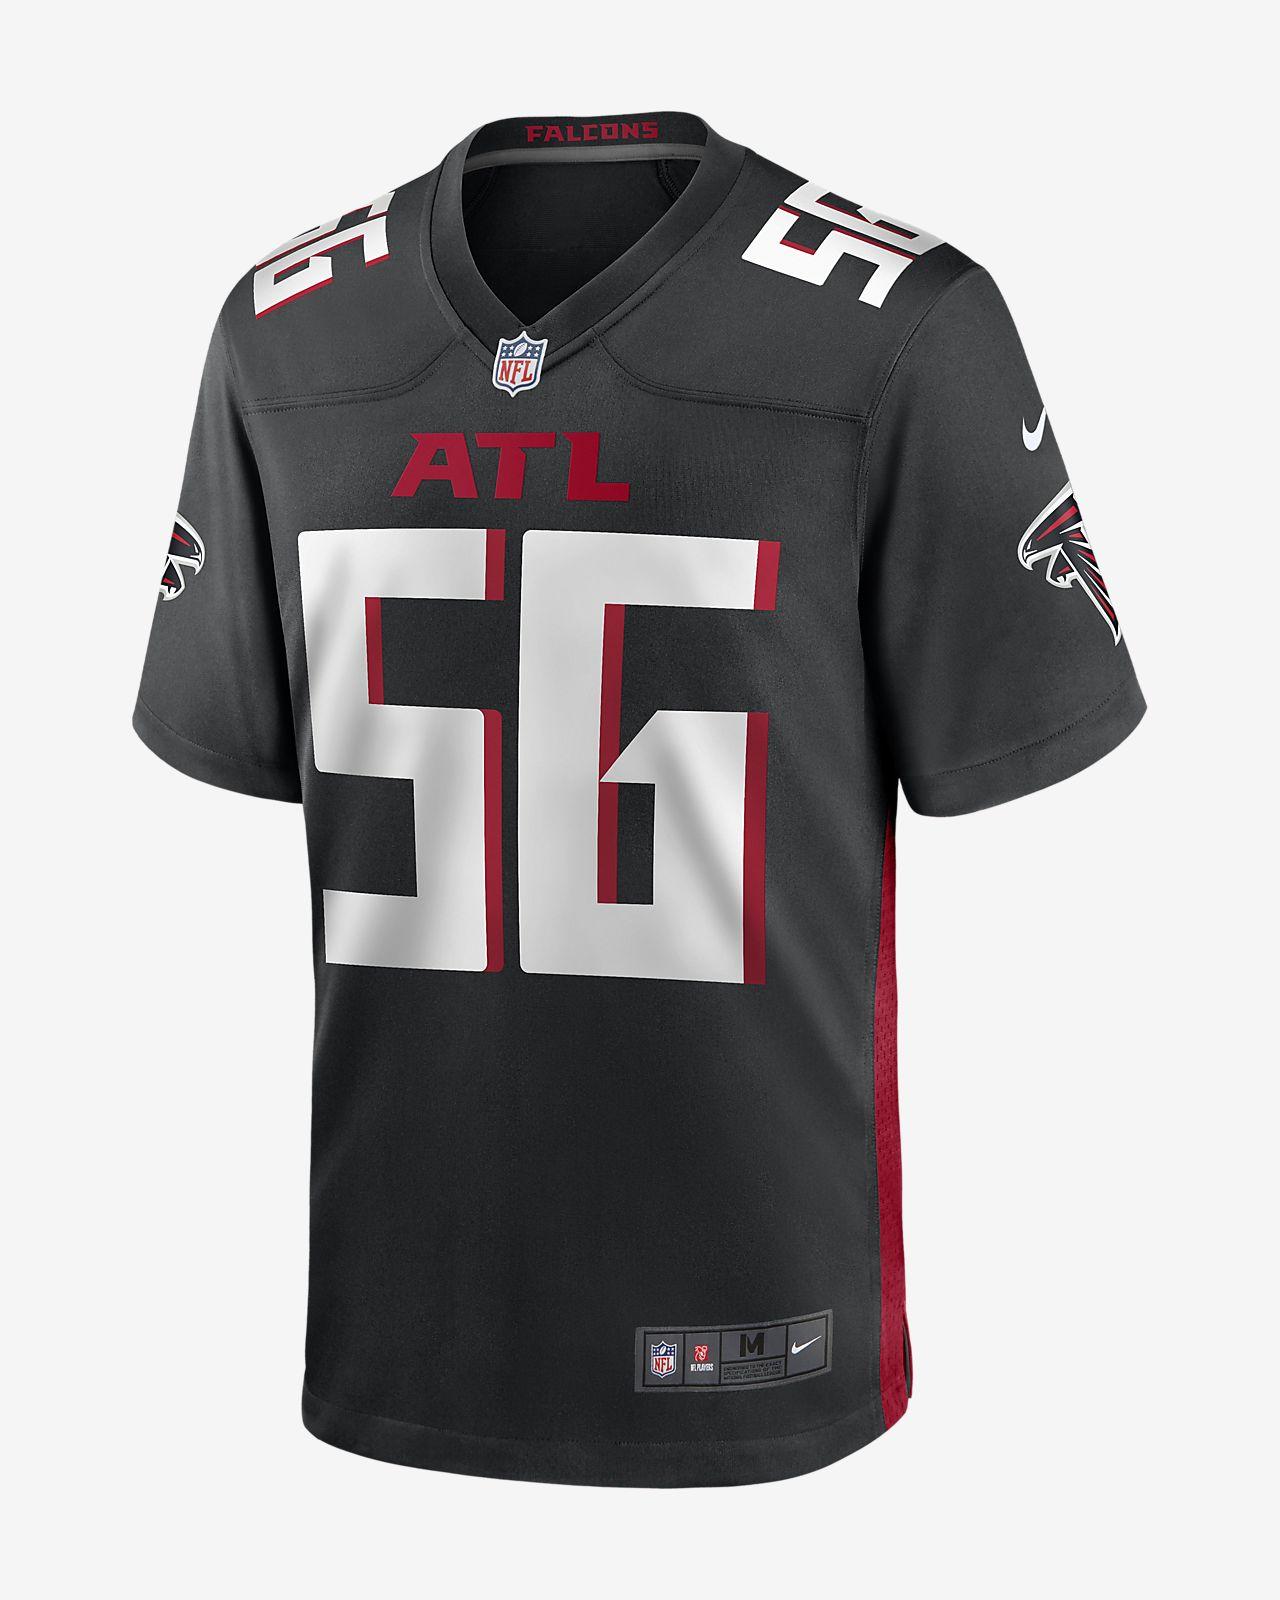 Camiseta de fútbol americano para hombre Game NFL Atlanta Falcons (Dante  Fowler Jr.)